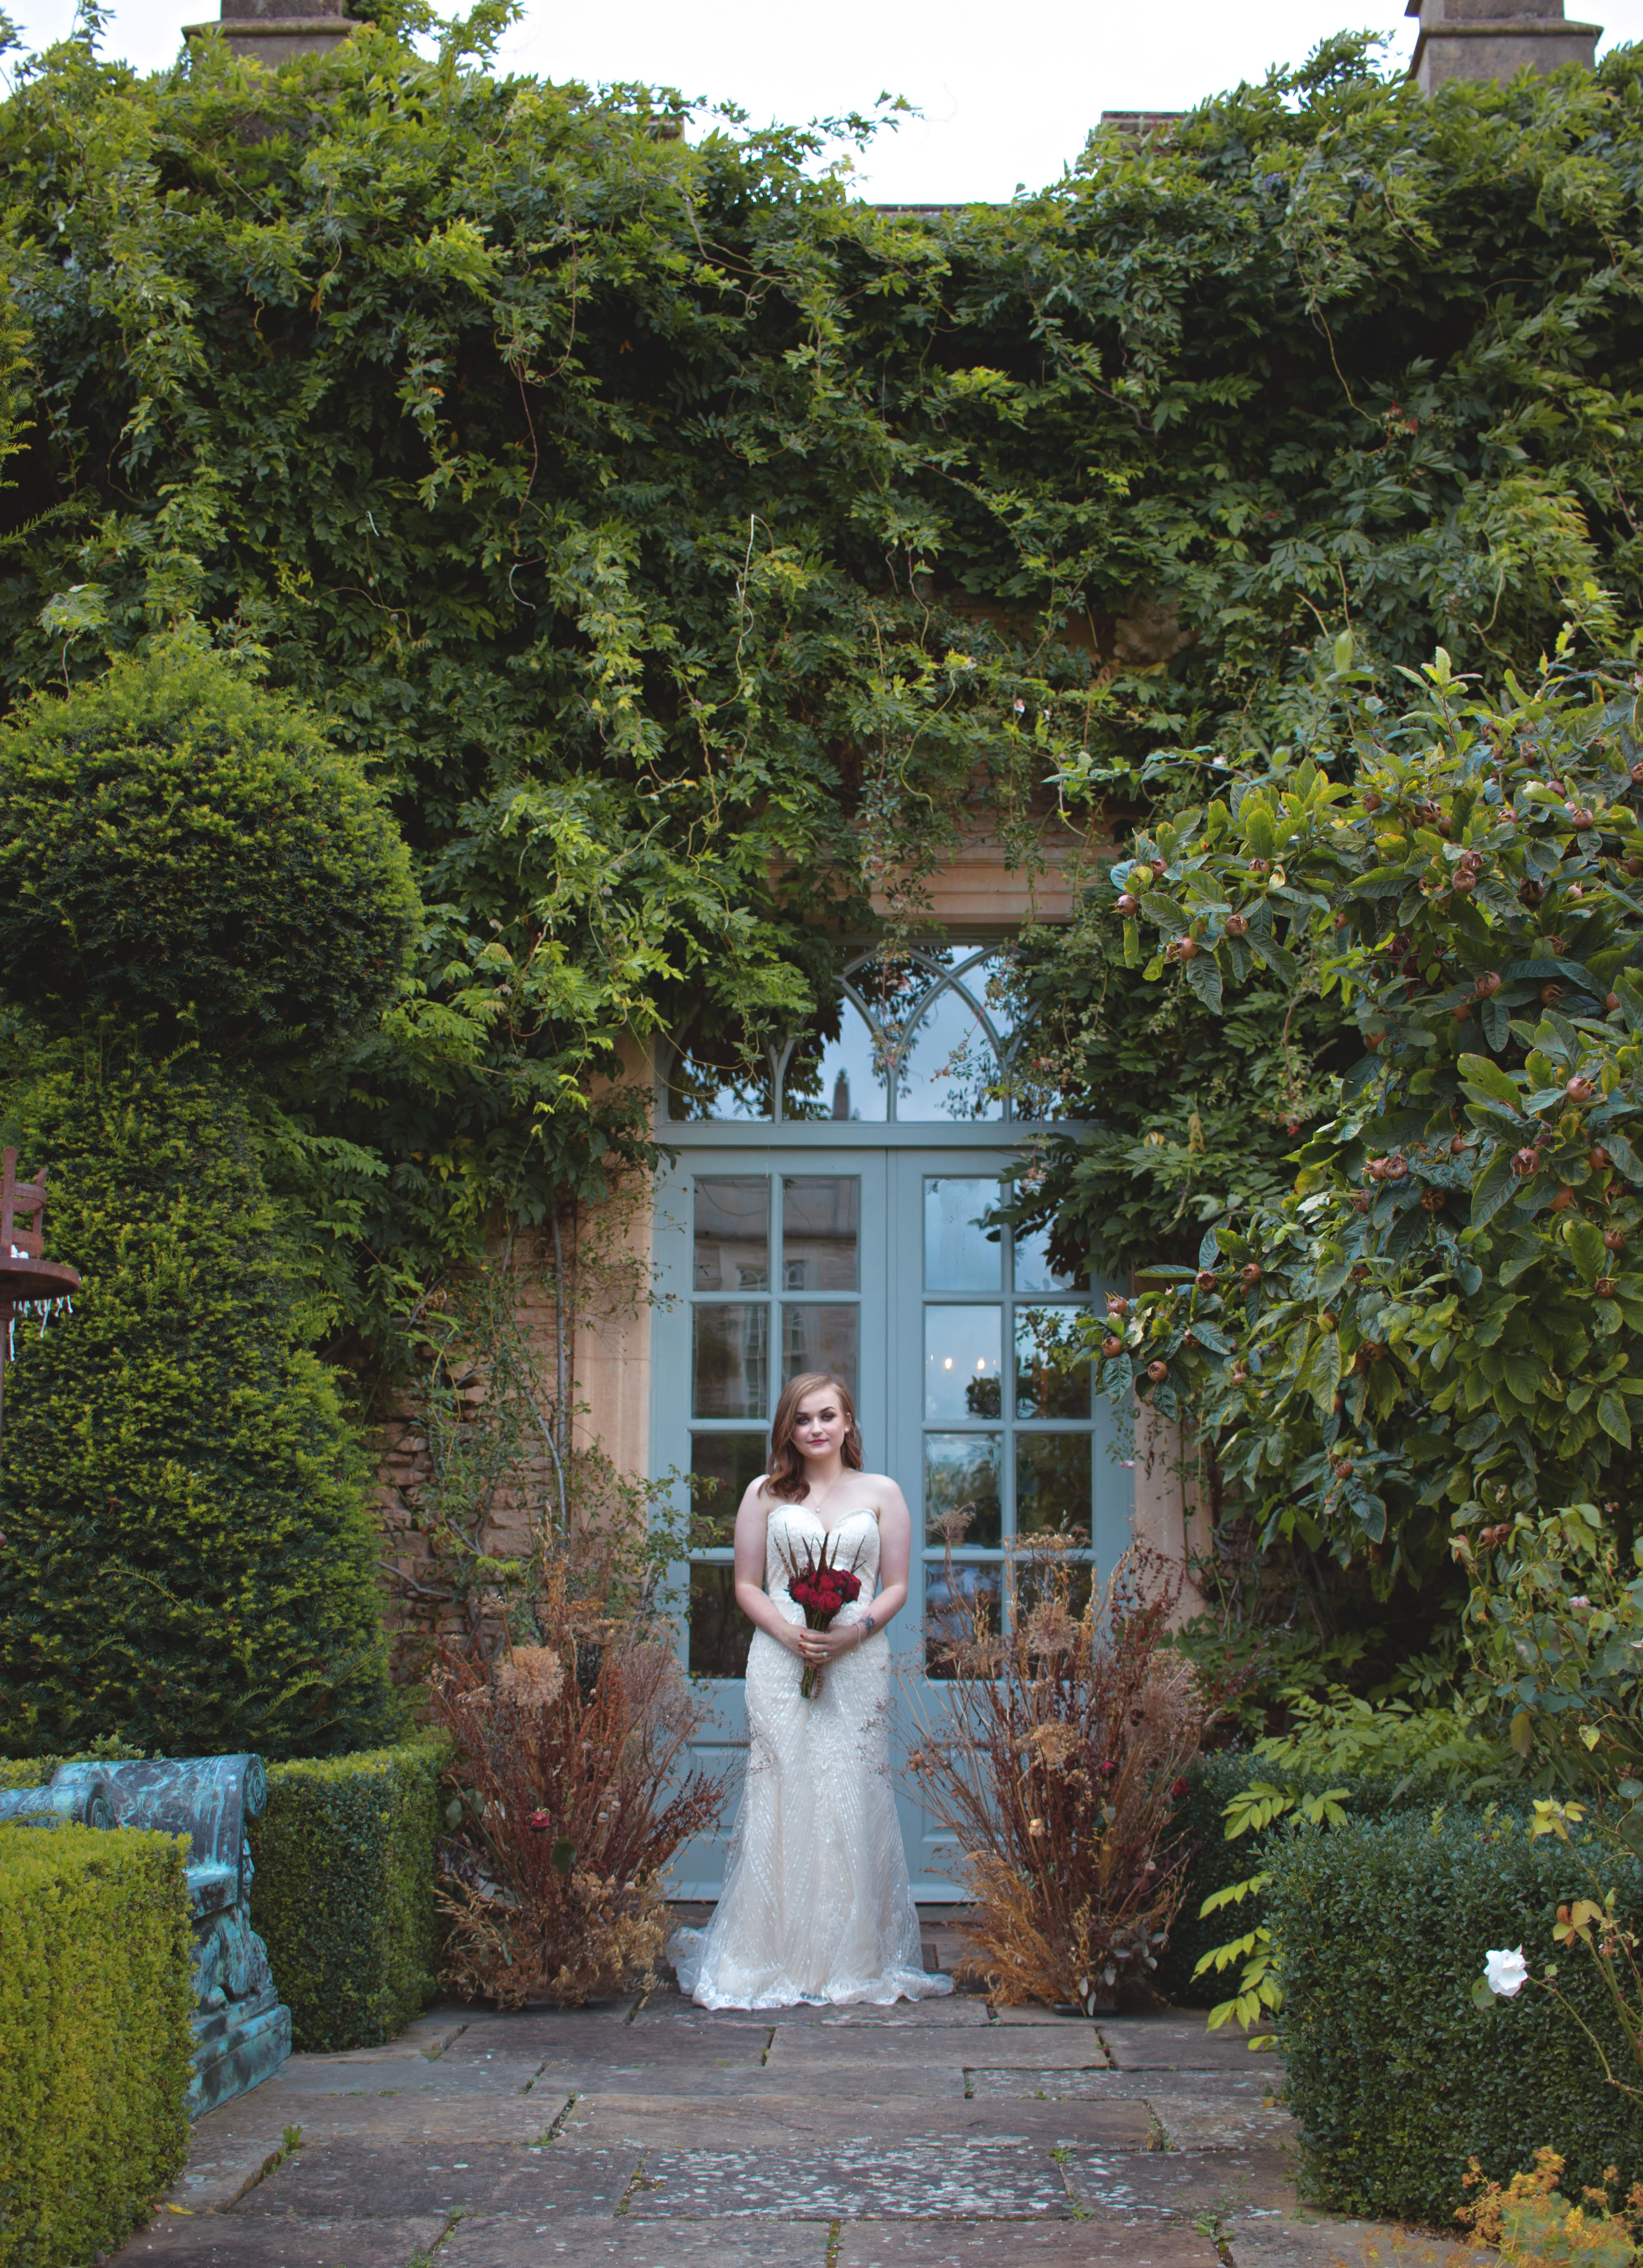 Bridal Portraits at Euridge Manor 1920s Themed Wedding